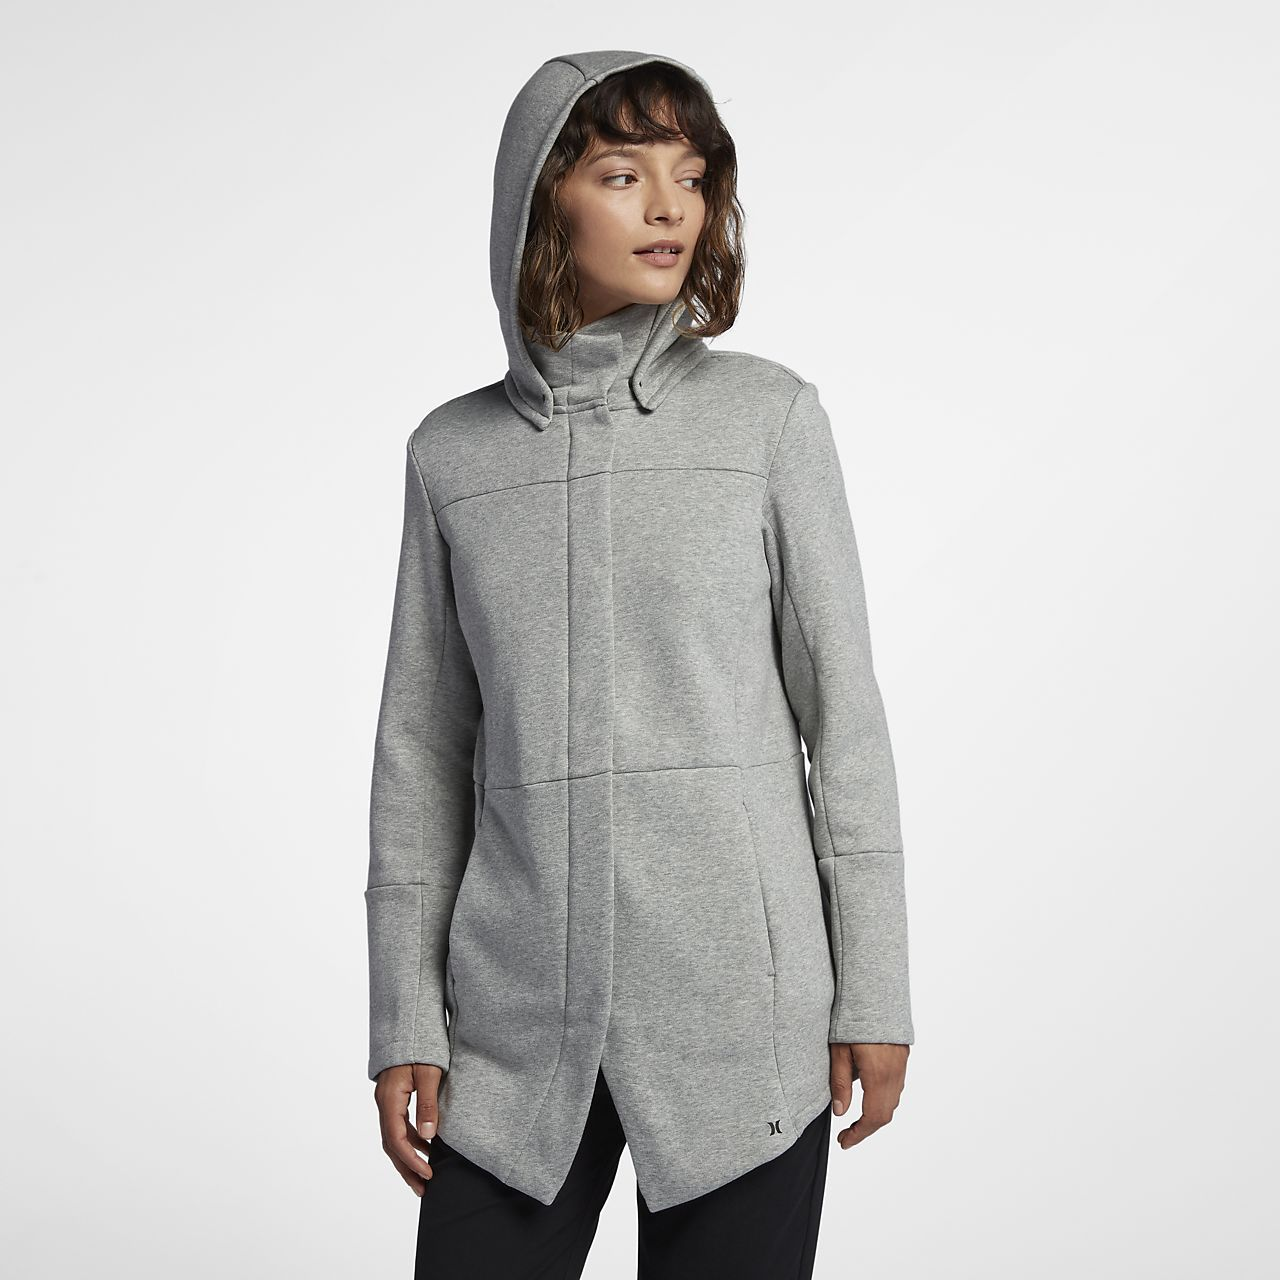 Hurley Womens Winchester Hoodie Asymmetrical Full Zip Fleece